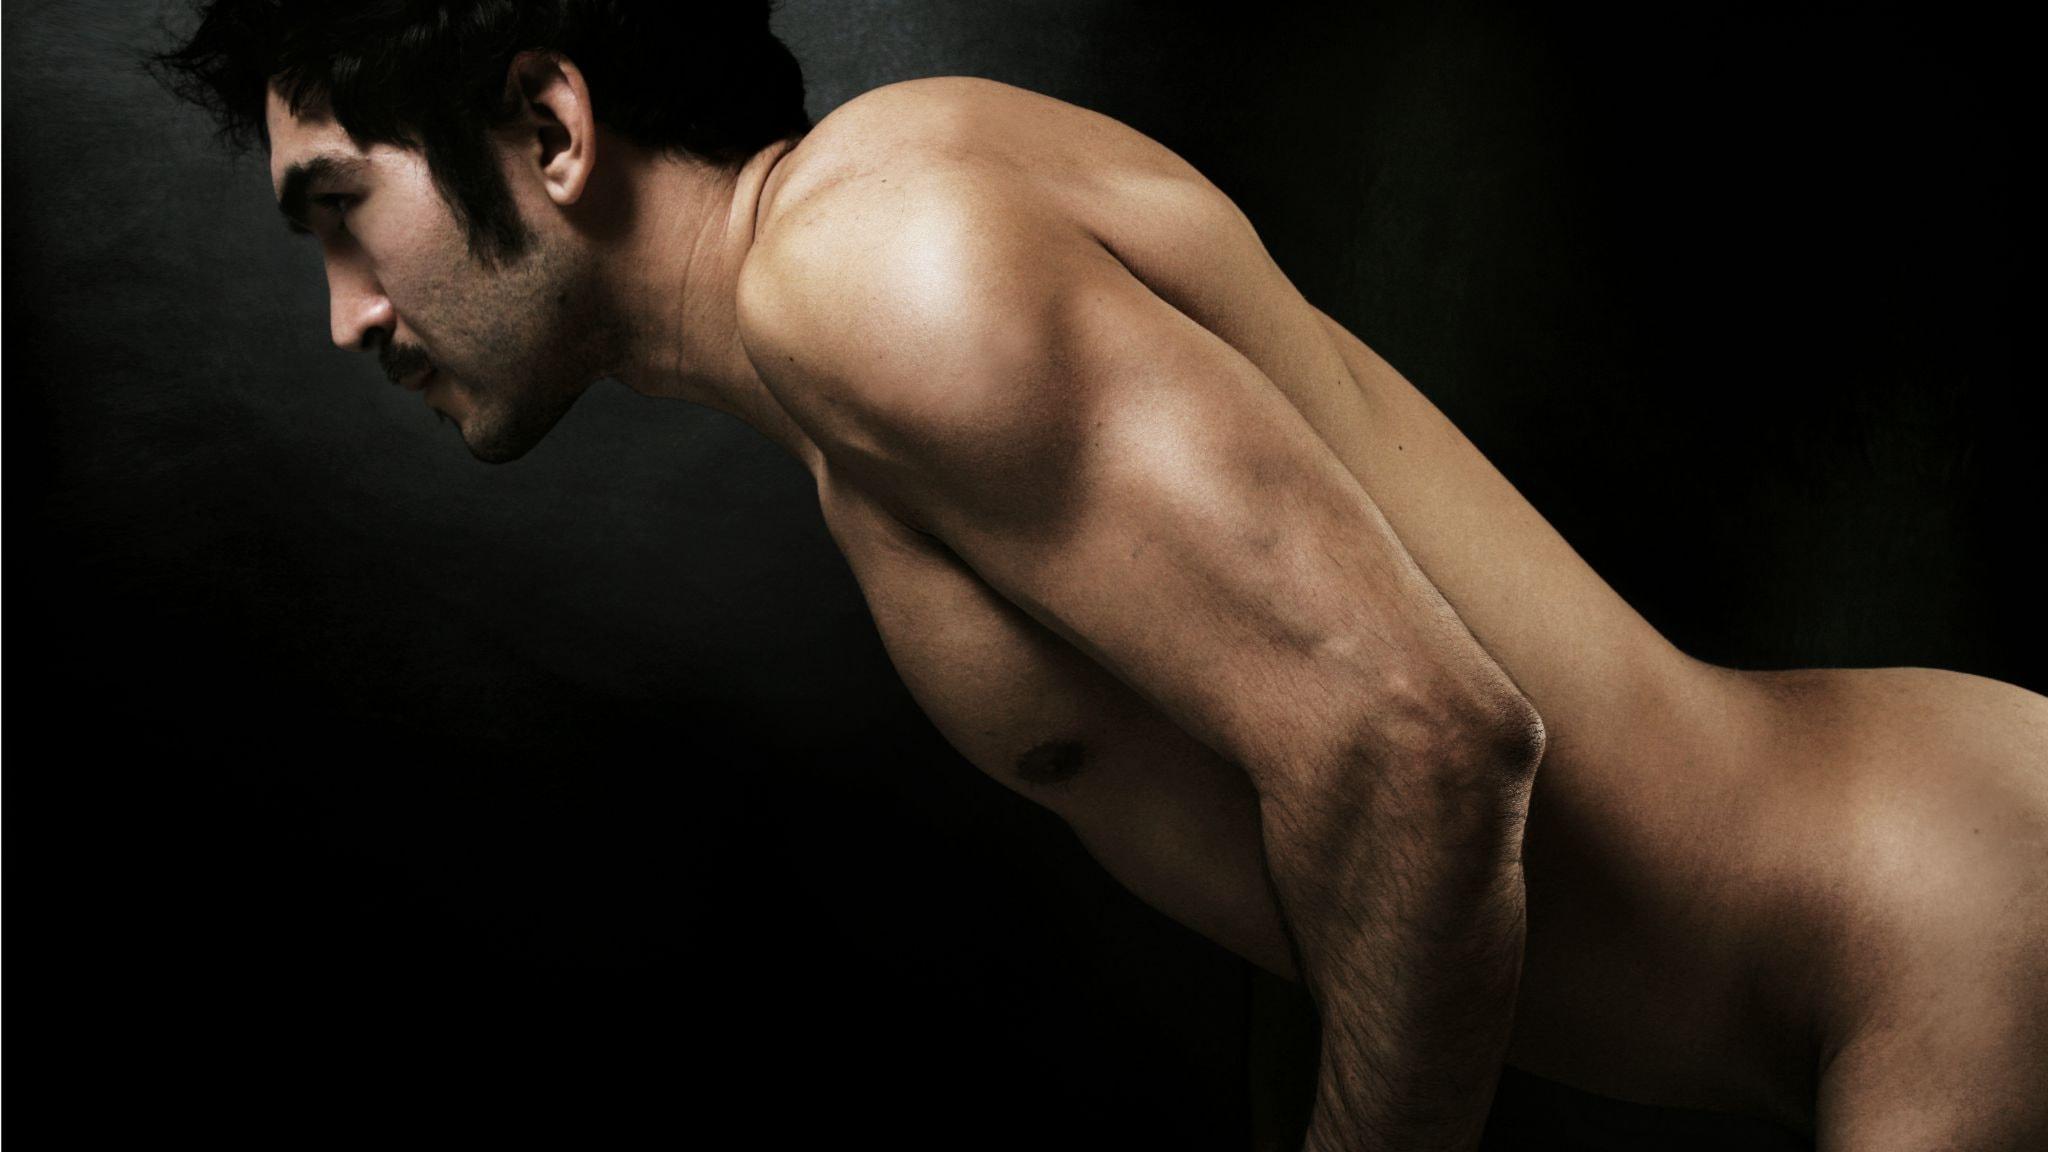 prostata sex dejting sajt